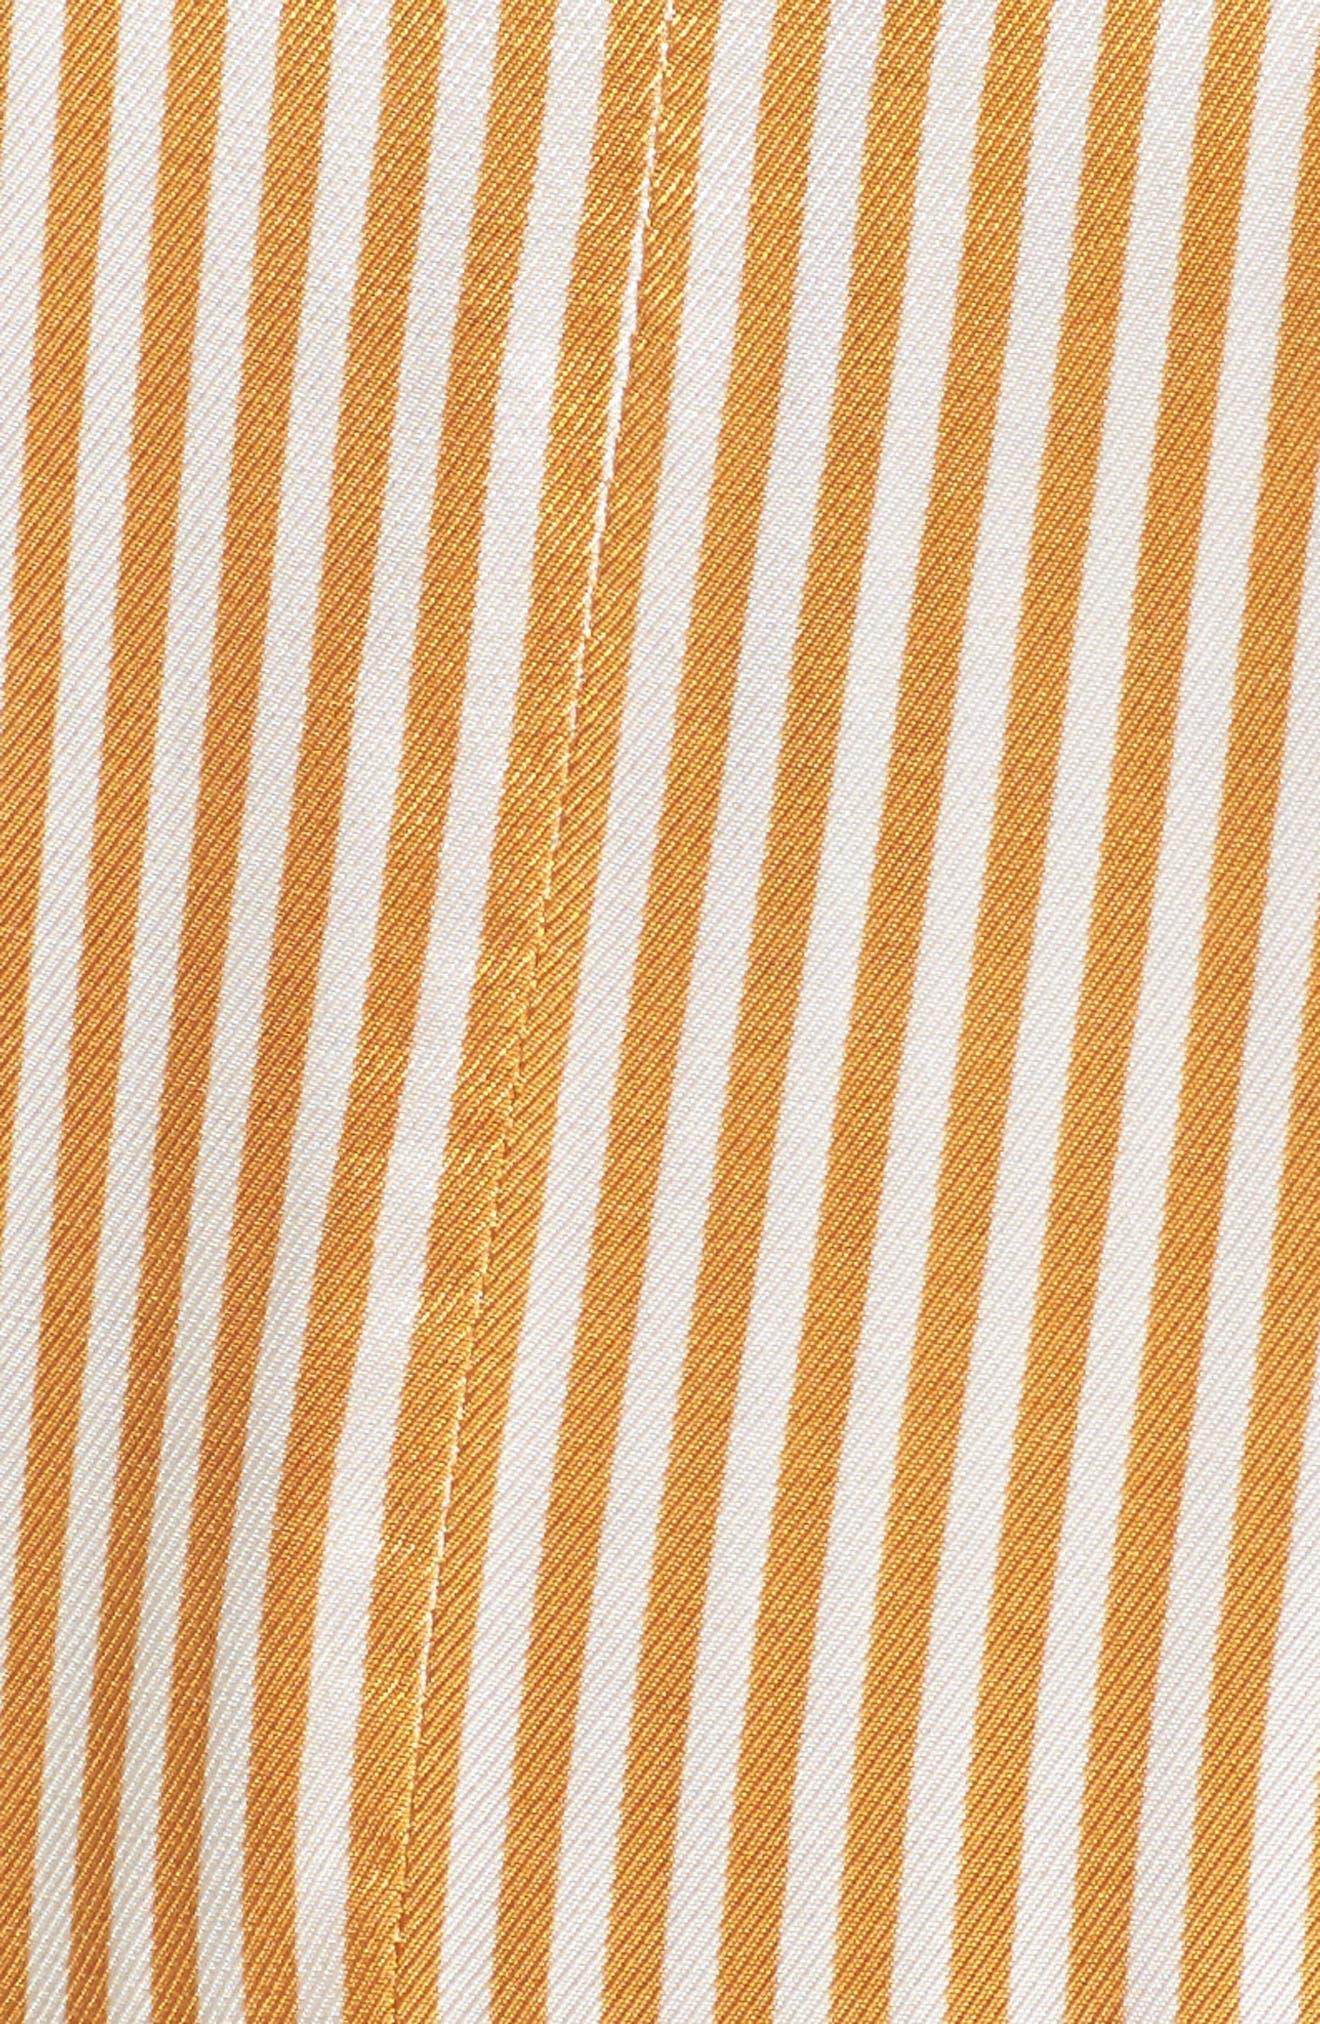 Clara Ruffle Minidress,                             Alternate thumbnail 5, color,                             250